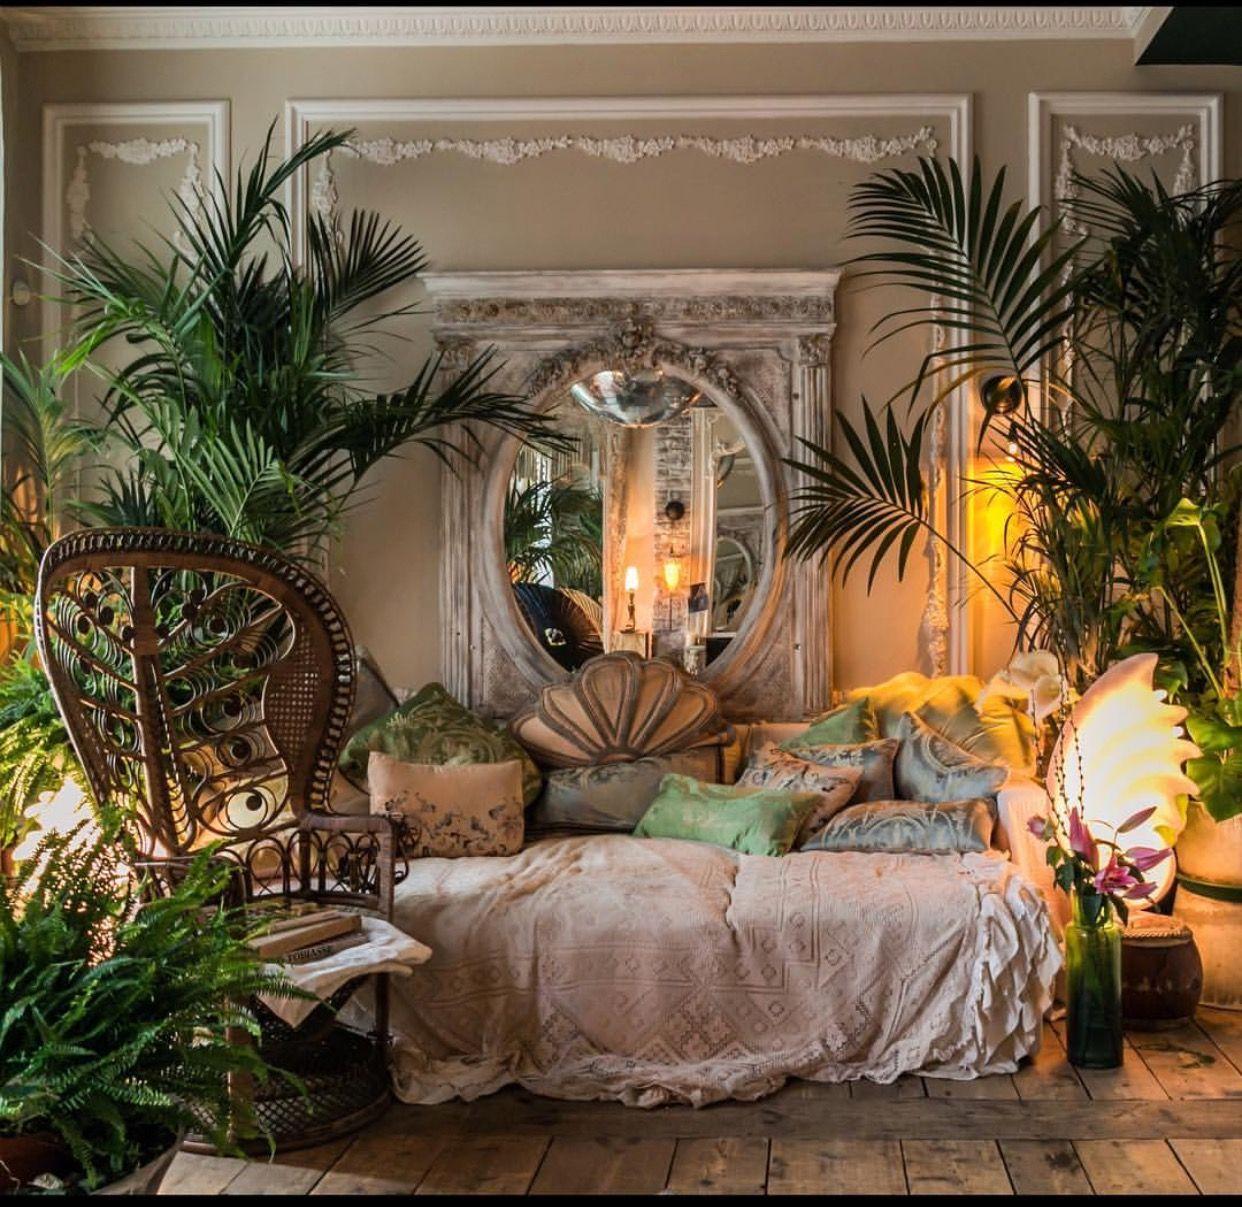 55 Bohemian Living Room Decor Ideas: Pin By Farwah W On Aesthetics